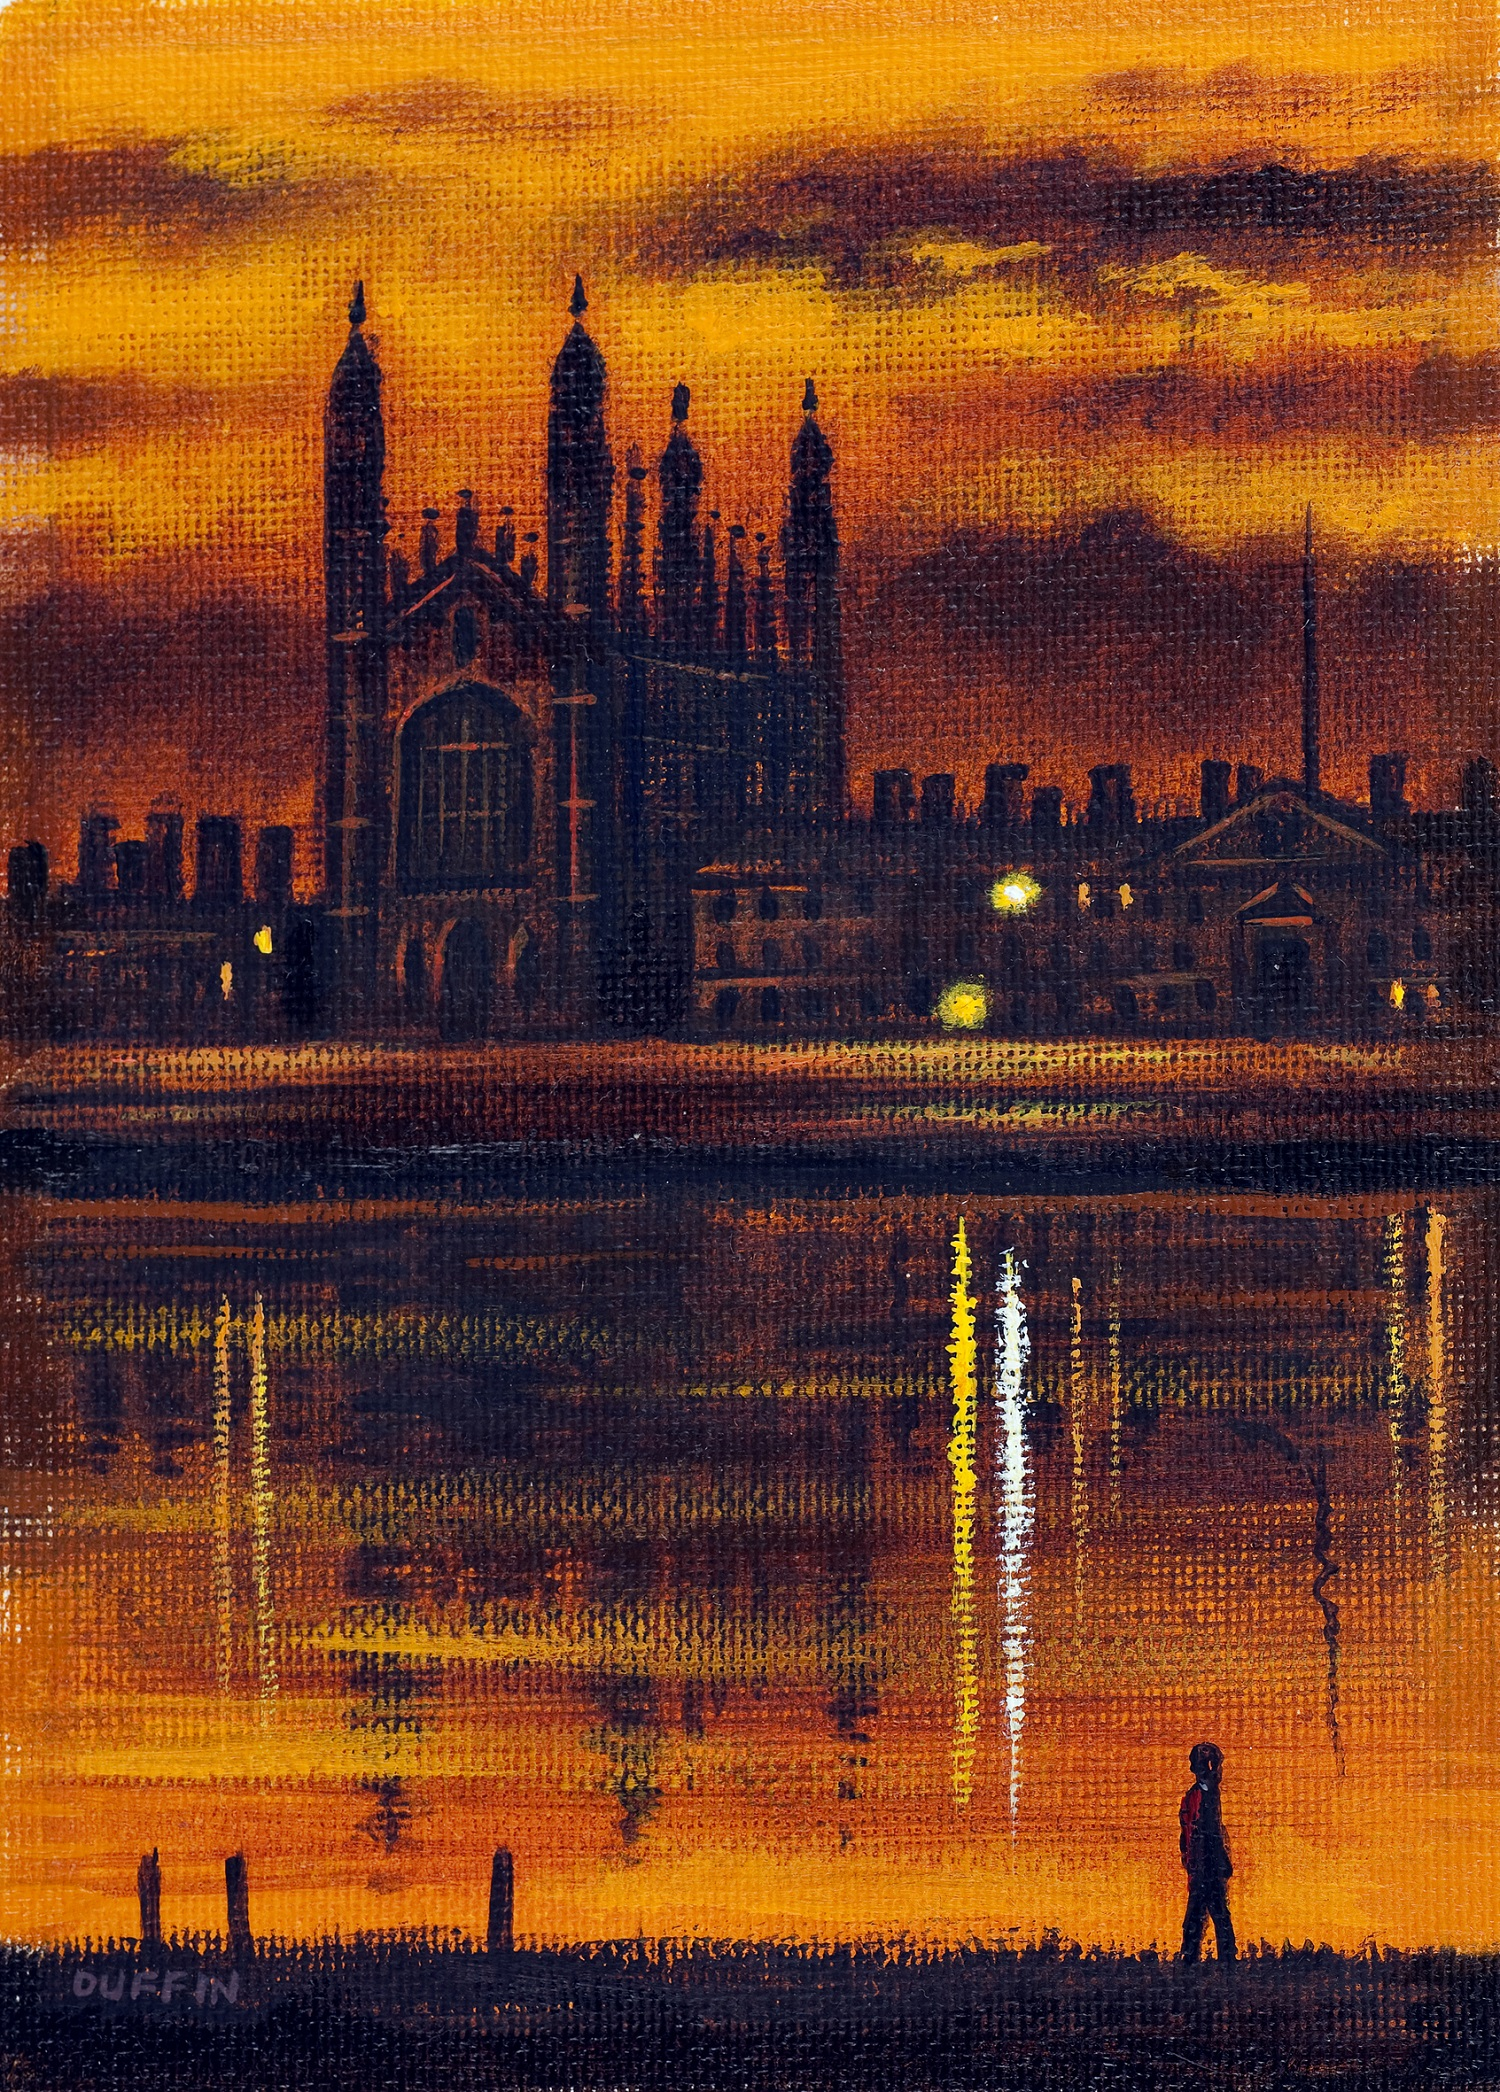 King's College, Cambridge Dusk  oil  16.5 x 11.5cm  £395